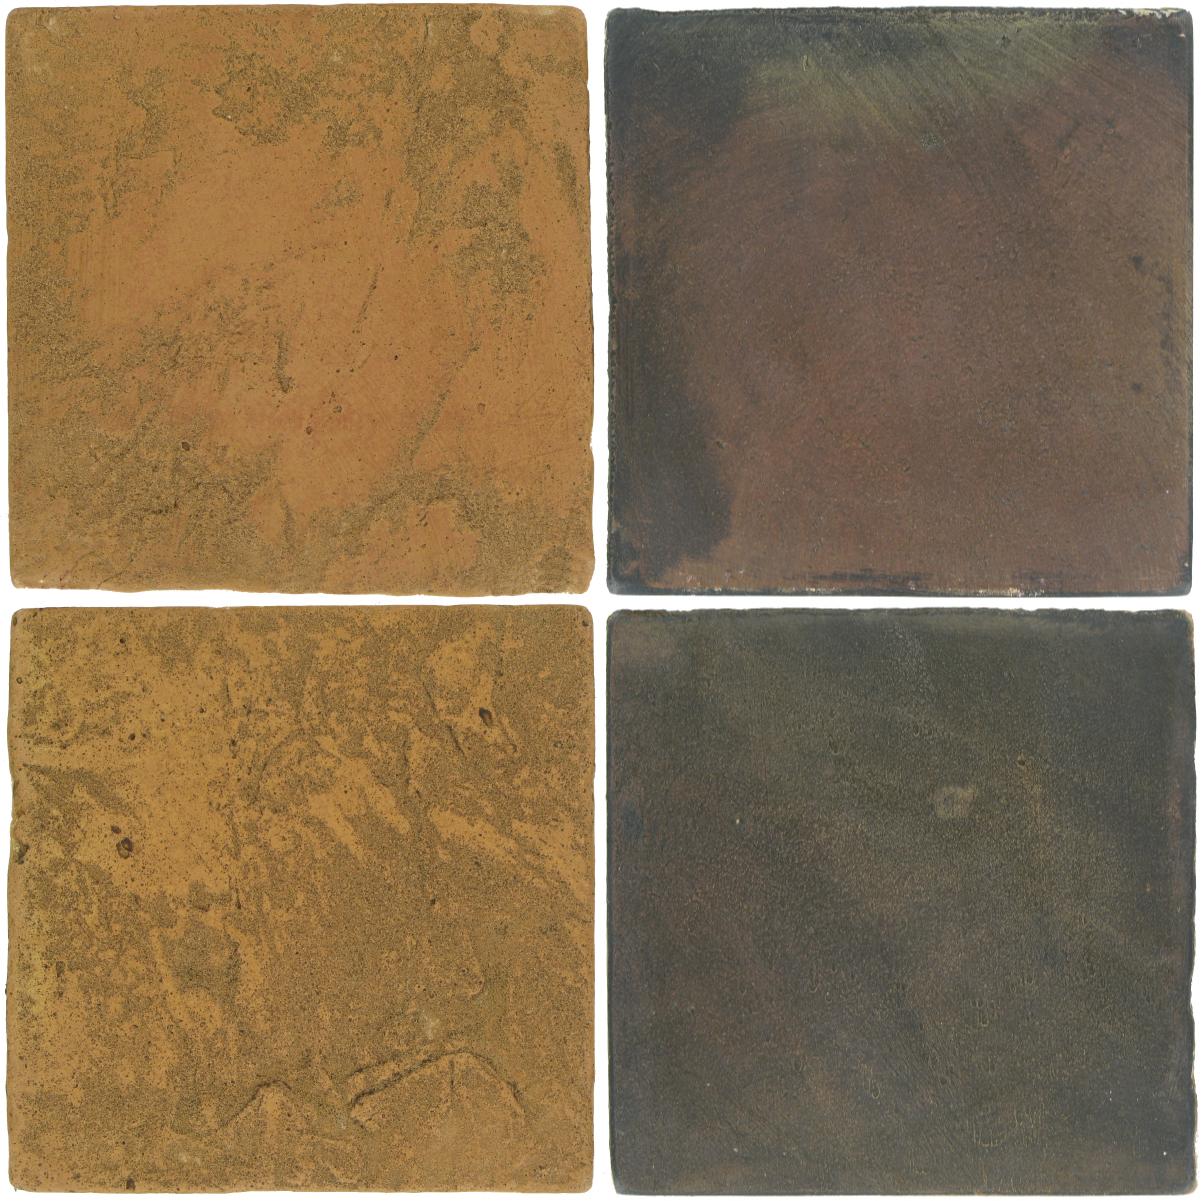 Pedralbes Antique Terracotta  2 Color Combinations  VTG-PSSW Siena Wheat + OHS-PSTG Terra Grey